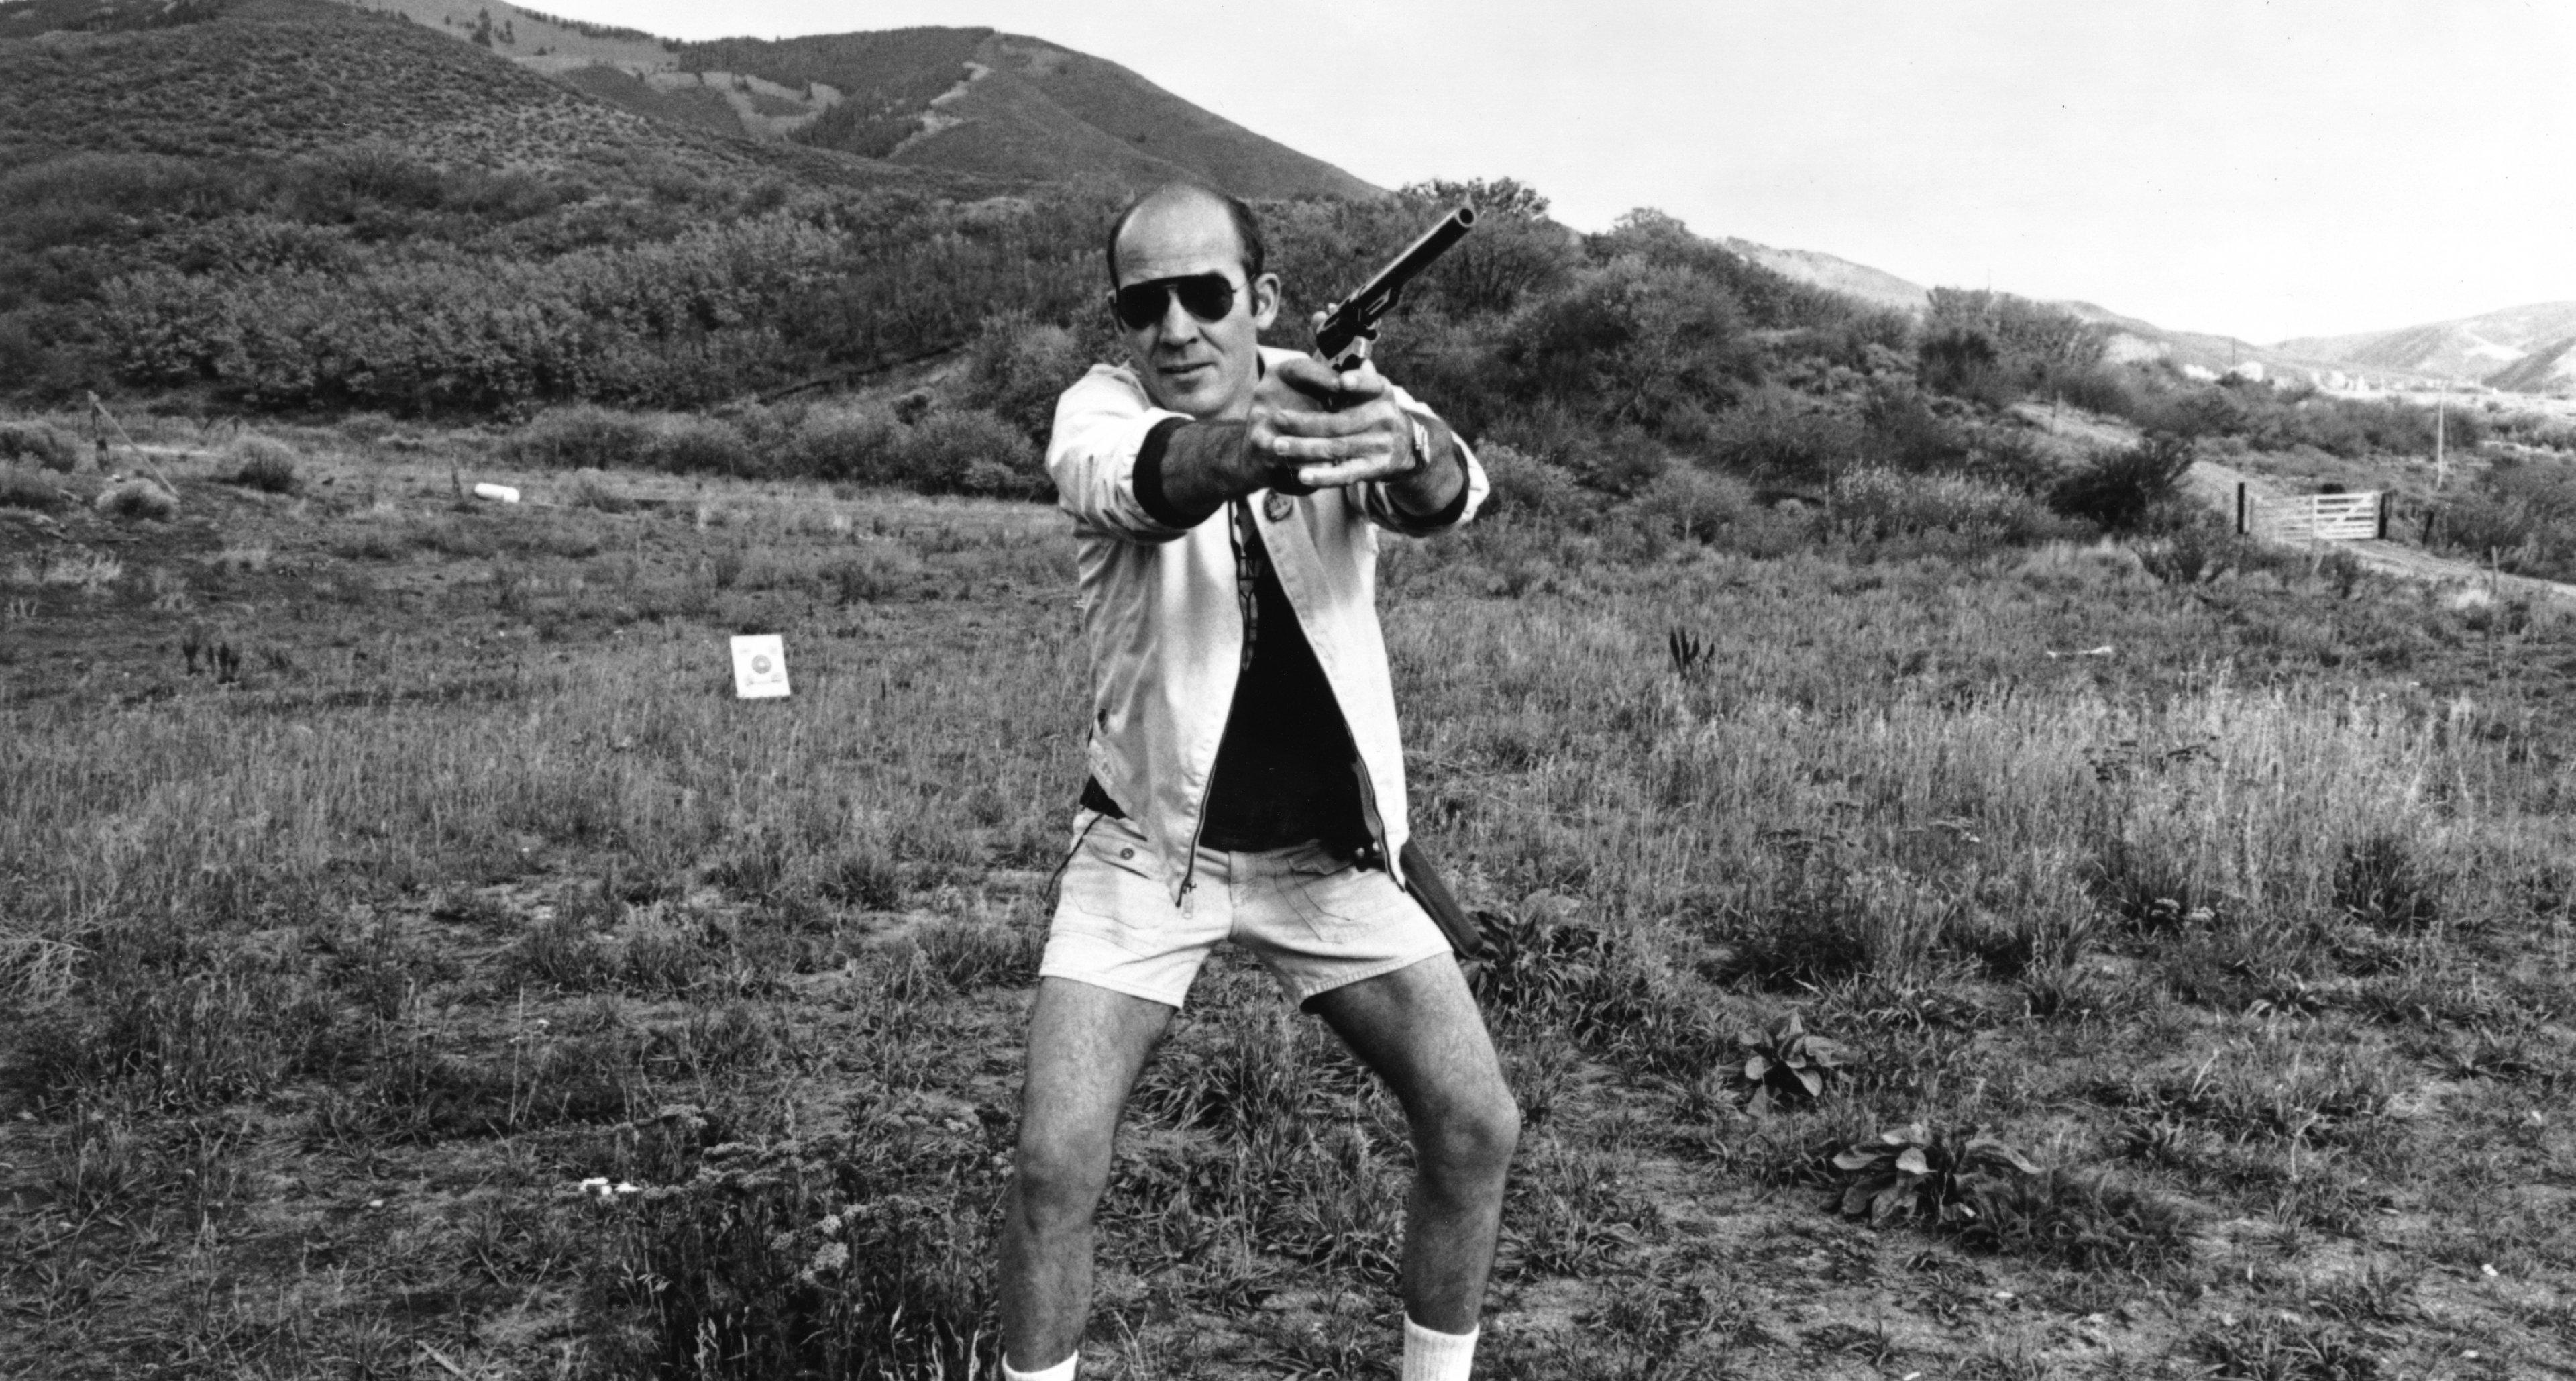 Gonzo Journalist Hunter S. Thompson giving it a shot around 1976.